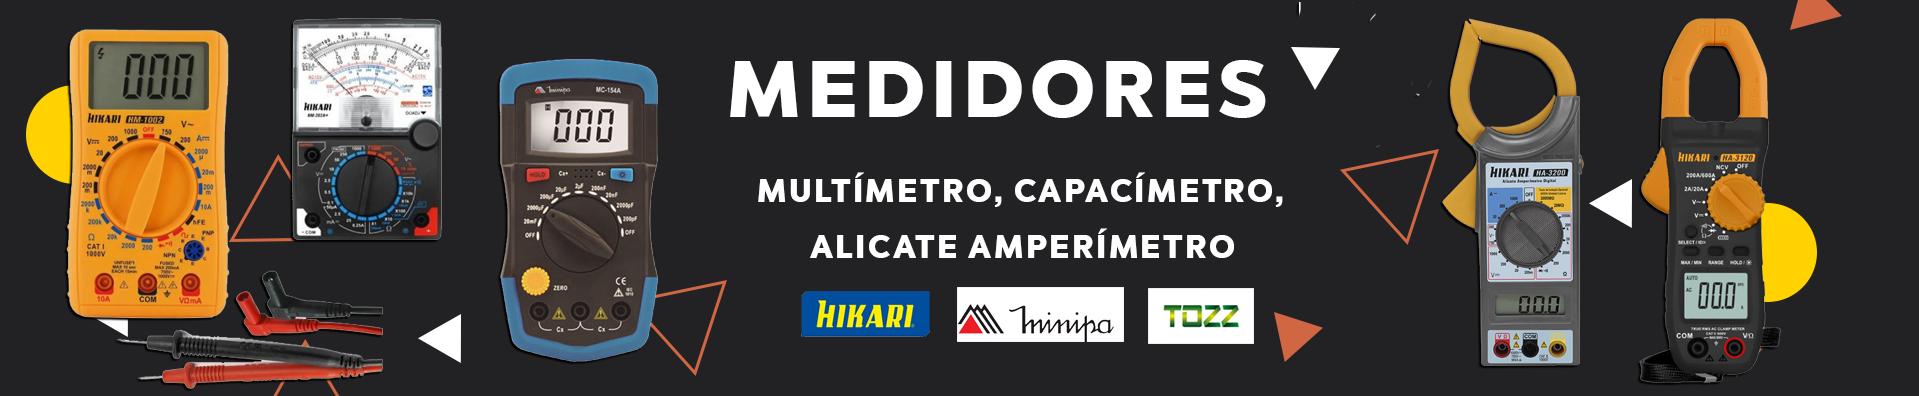 Multímetro, Capacímetro, Alicate Amperímetro